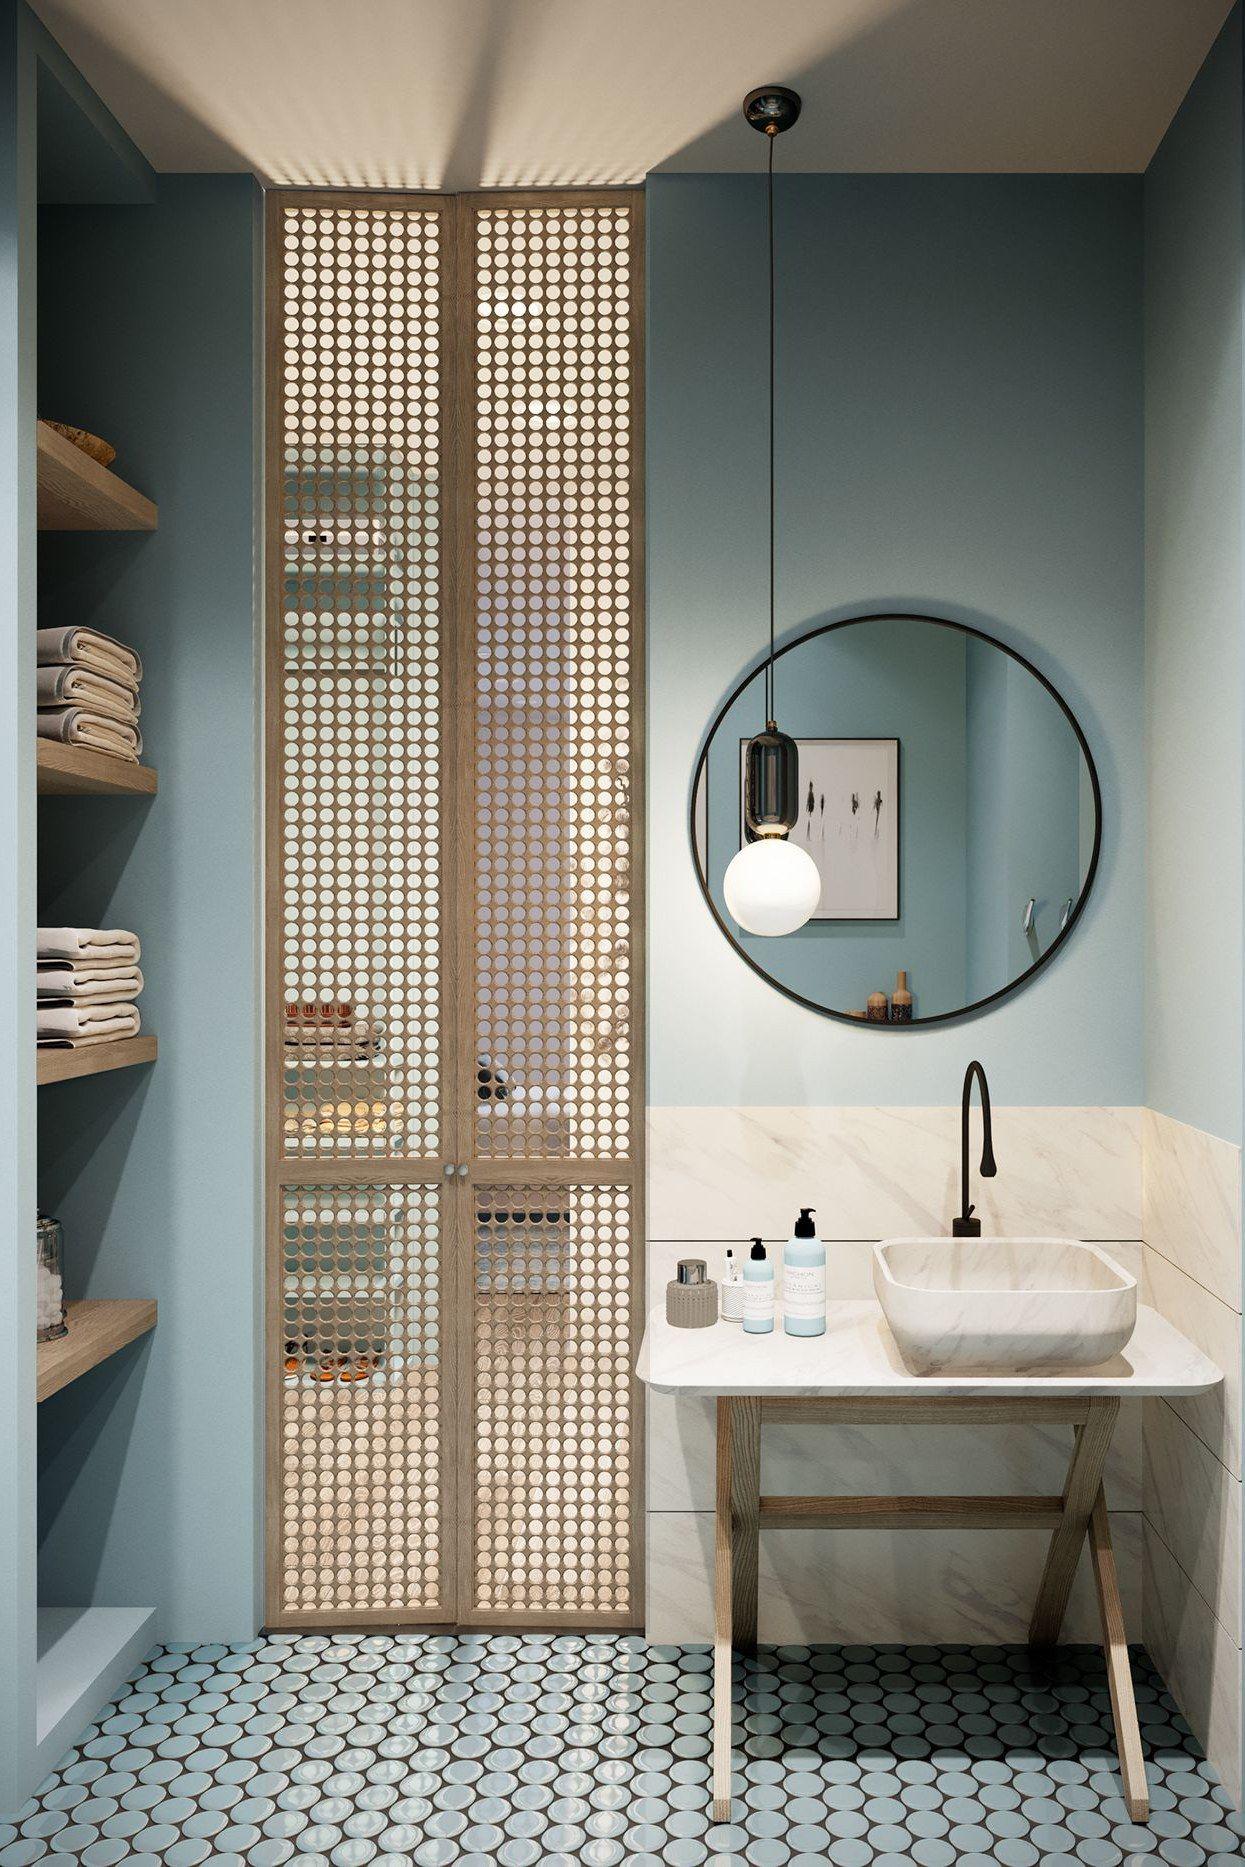 Bathroom Decor Make A Splash From Your Bathroom Decor By